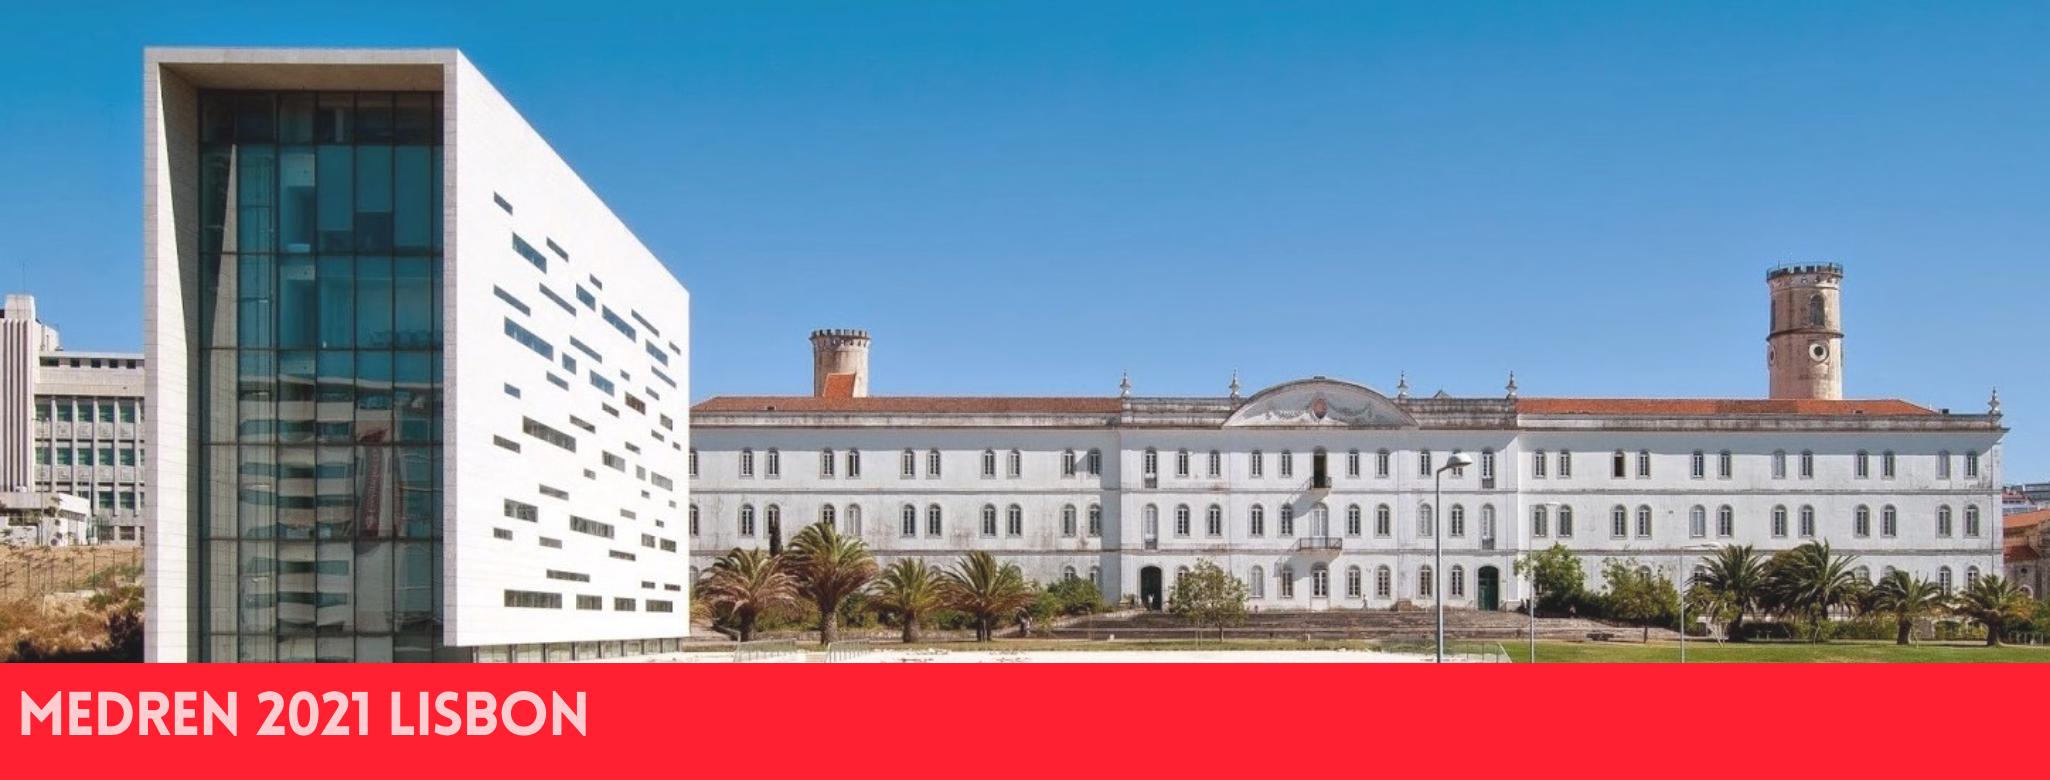 MedRen 2021 Lisbon